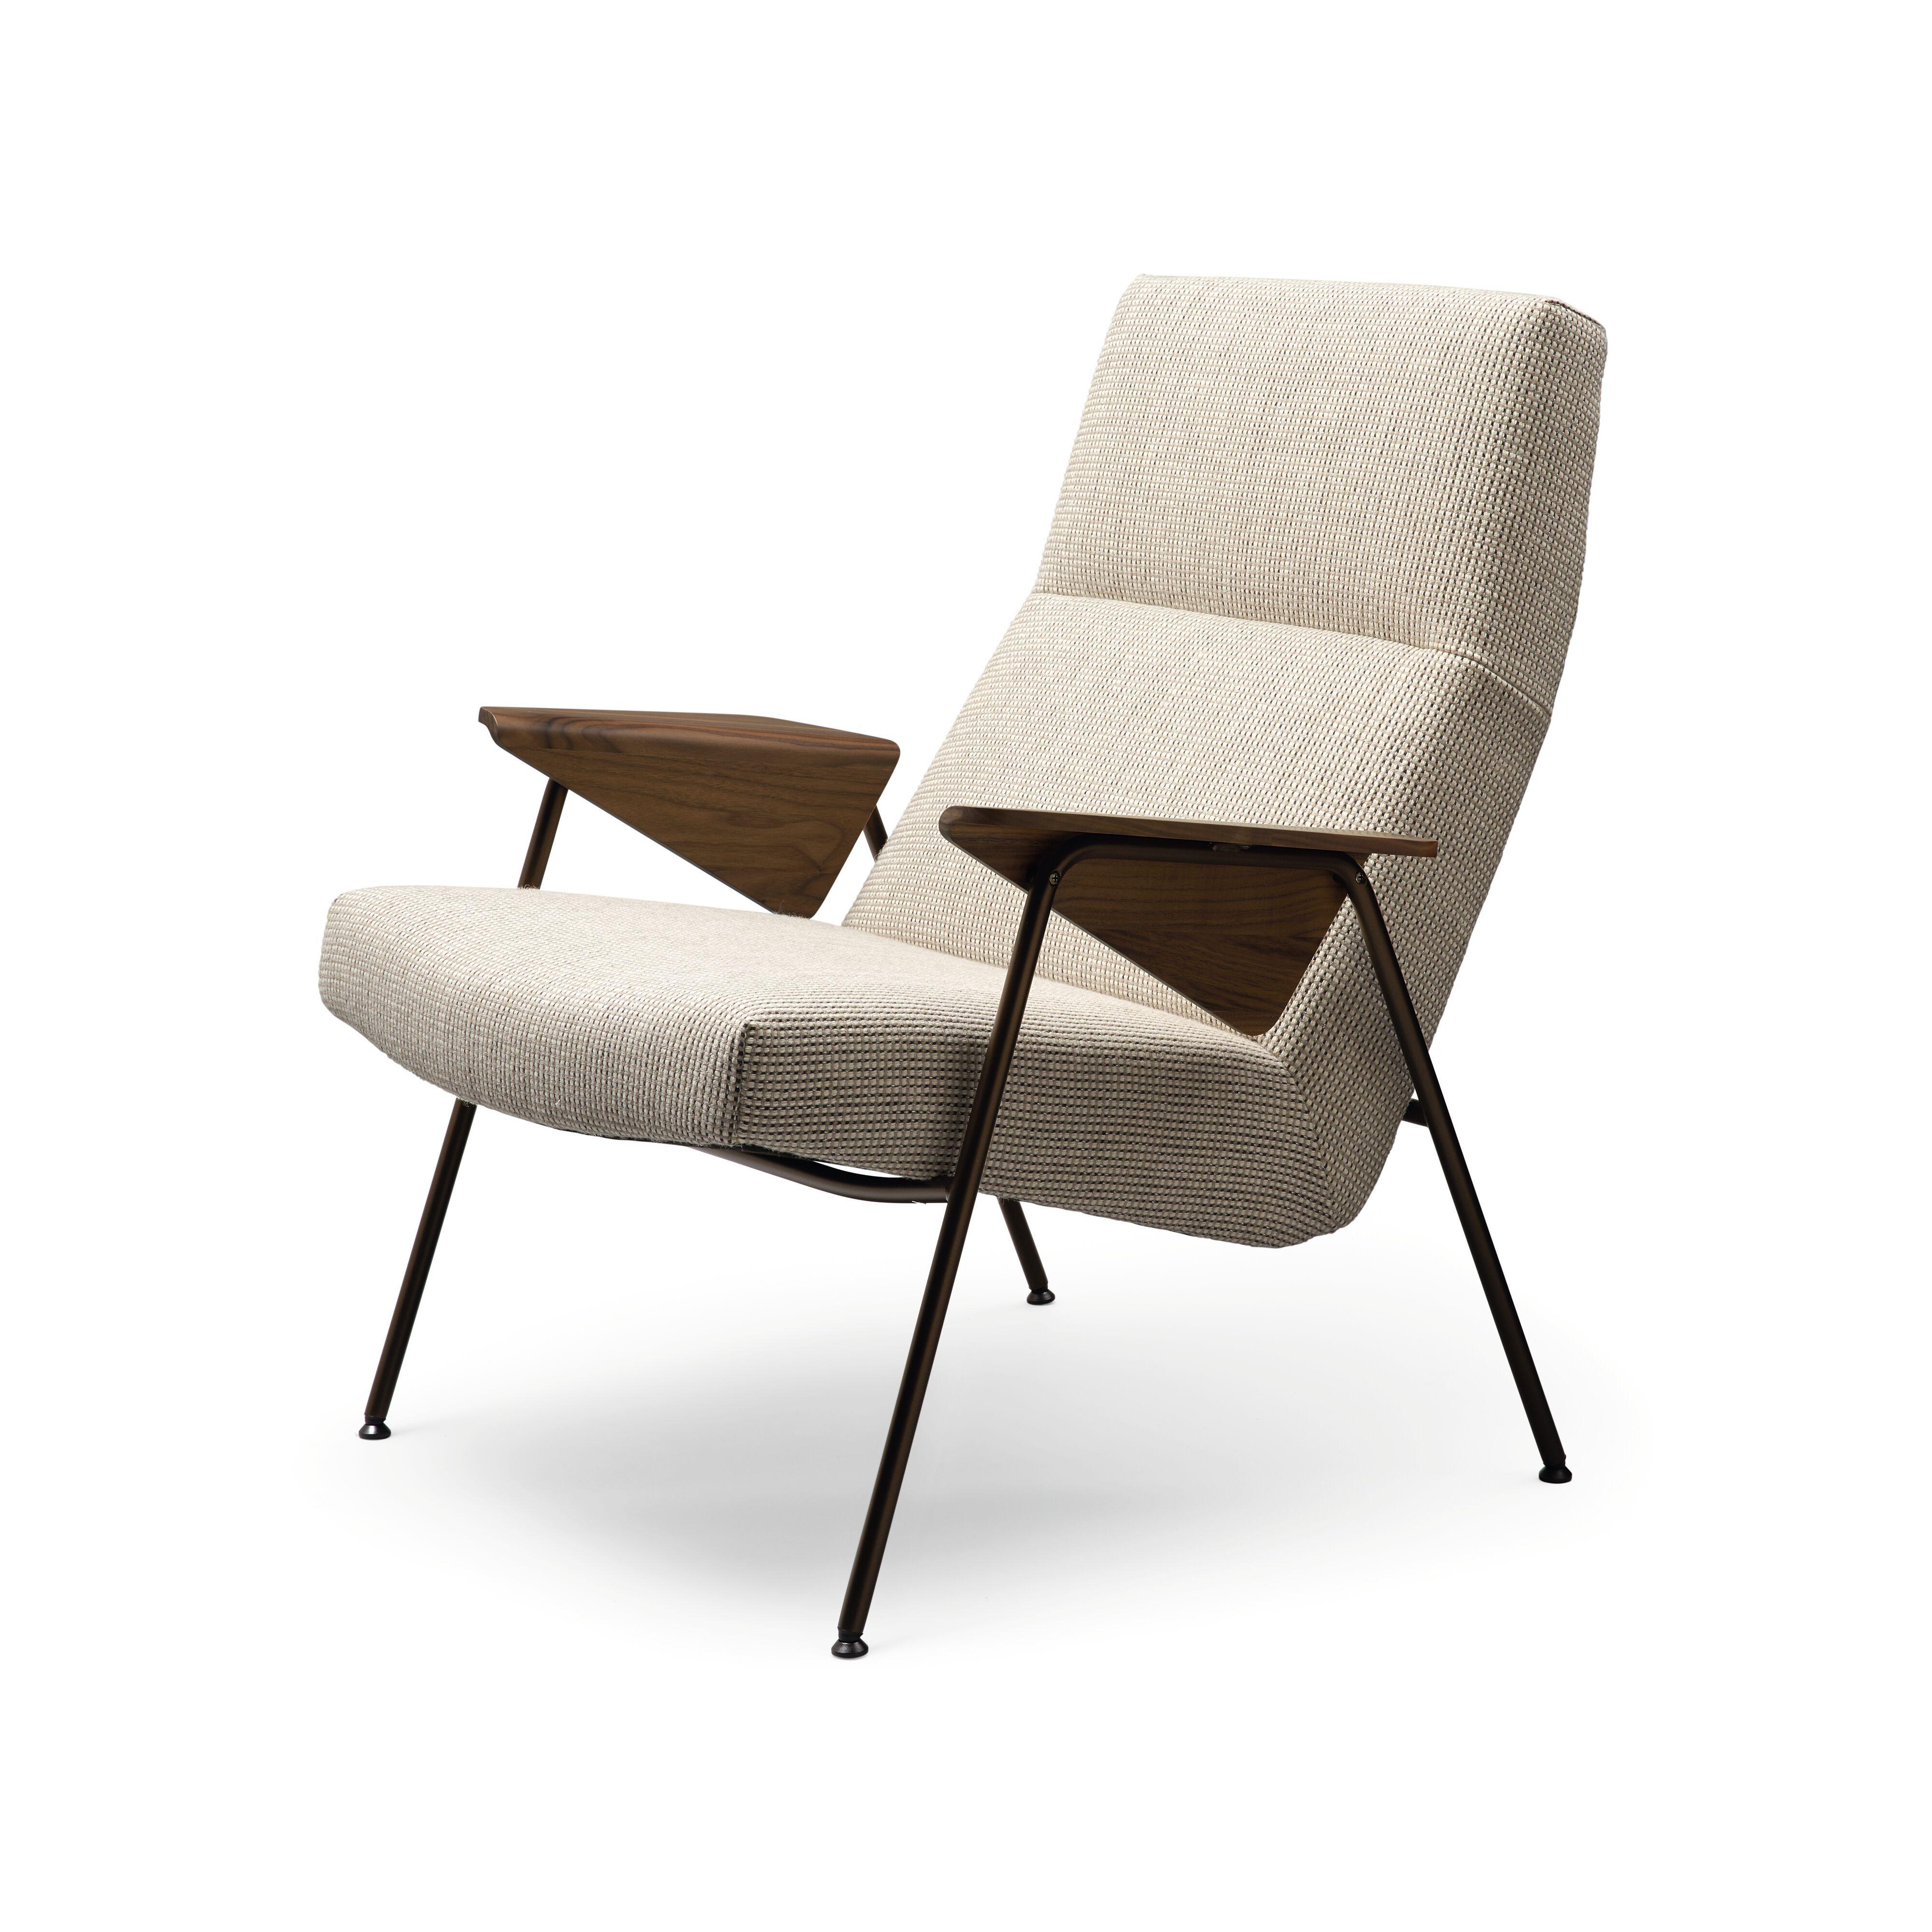 05-WK-Classic_Edition-Votteler_Chair-0009-H.tif